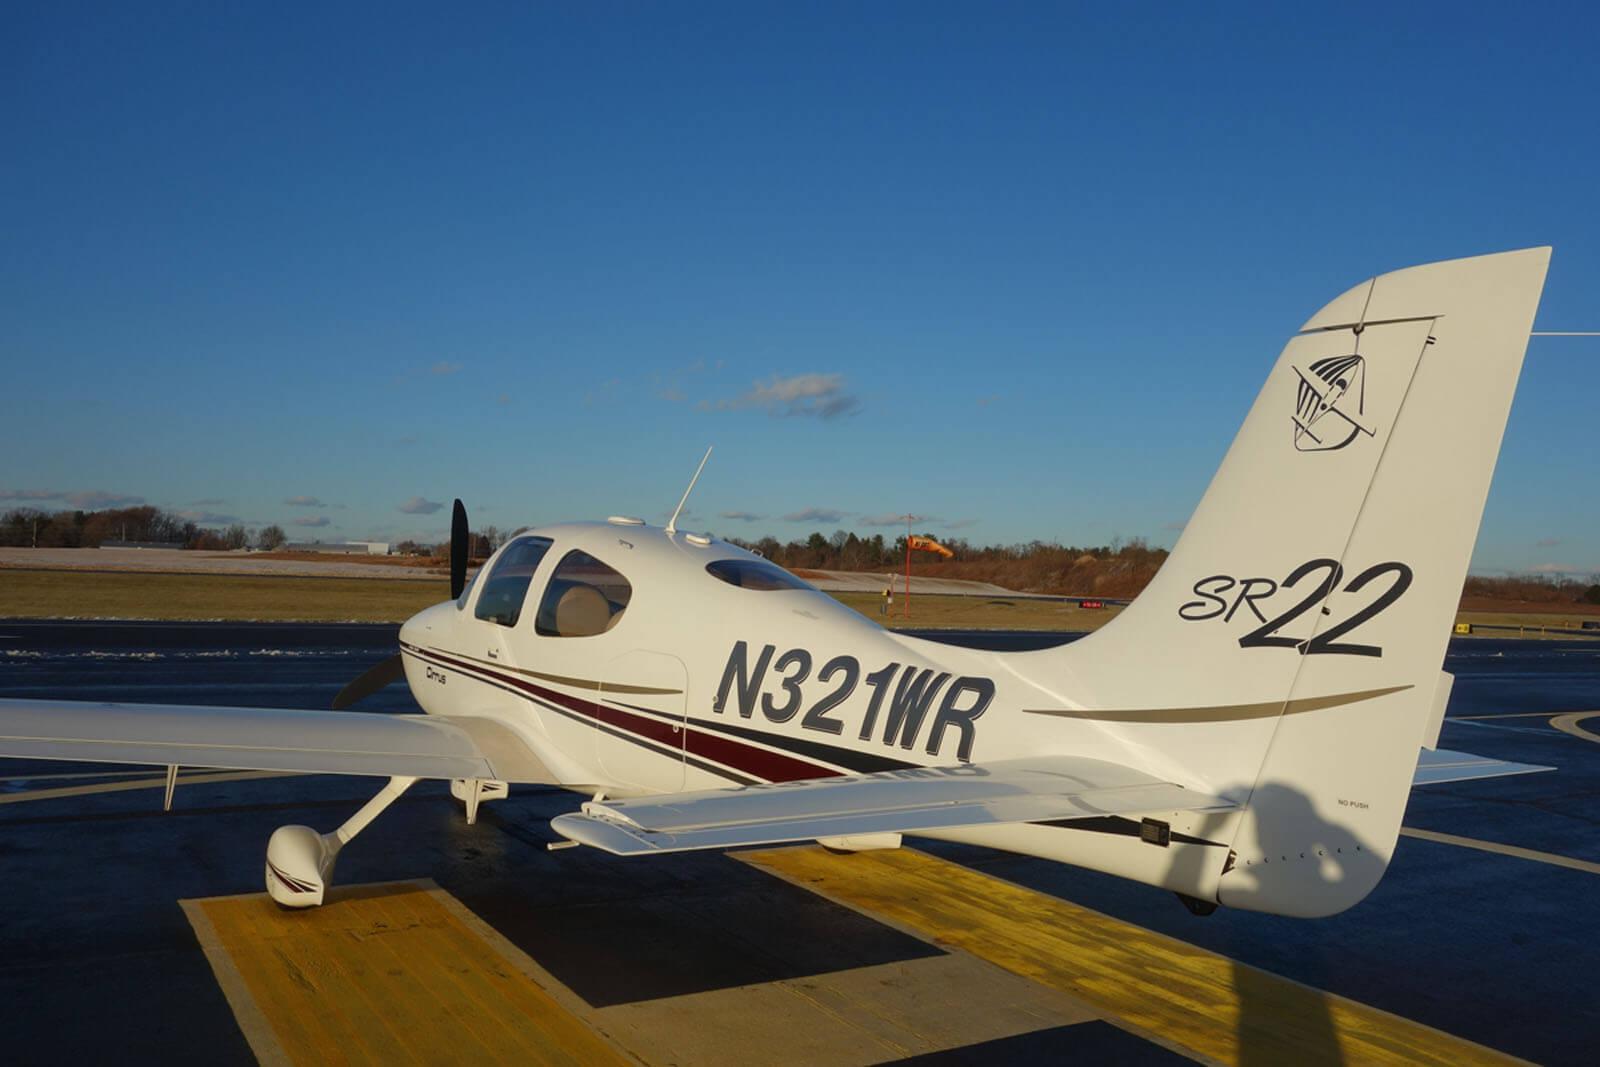 2002 Cirrus SR22 – FOR SALE at Princeton Airport - Contact Ken Nierenberg at 609-731-4628